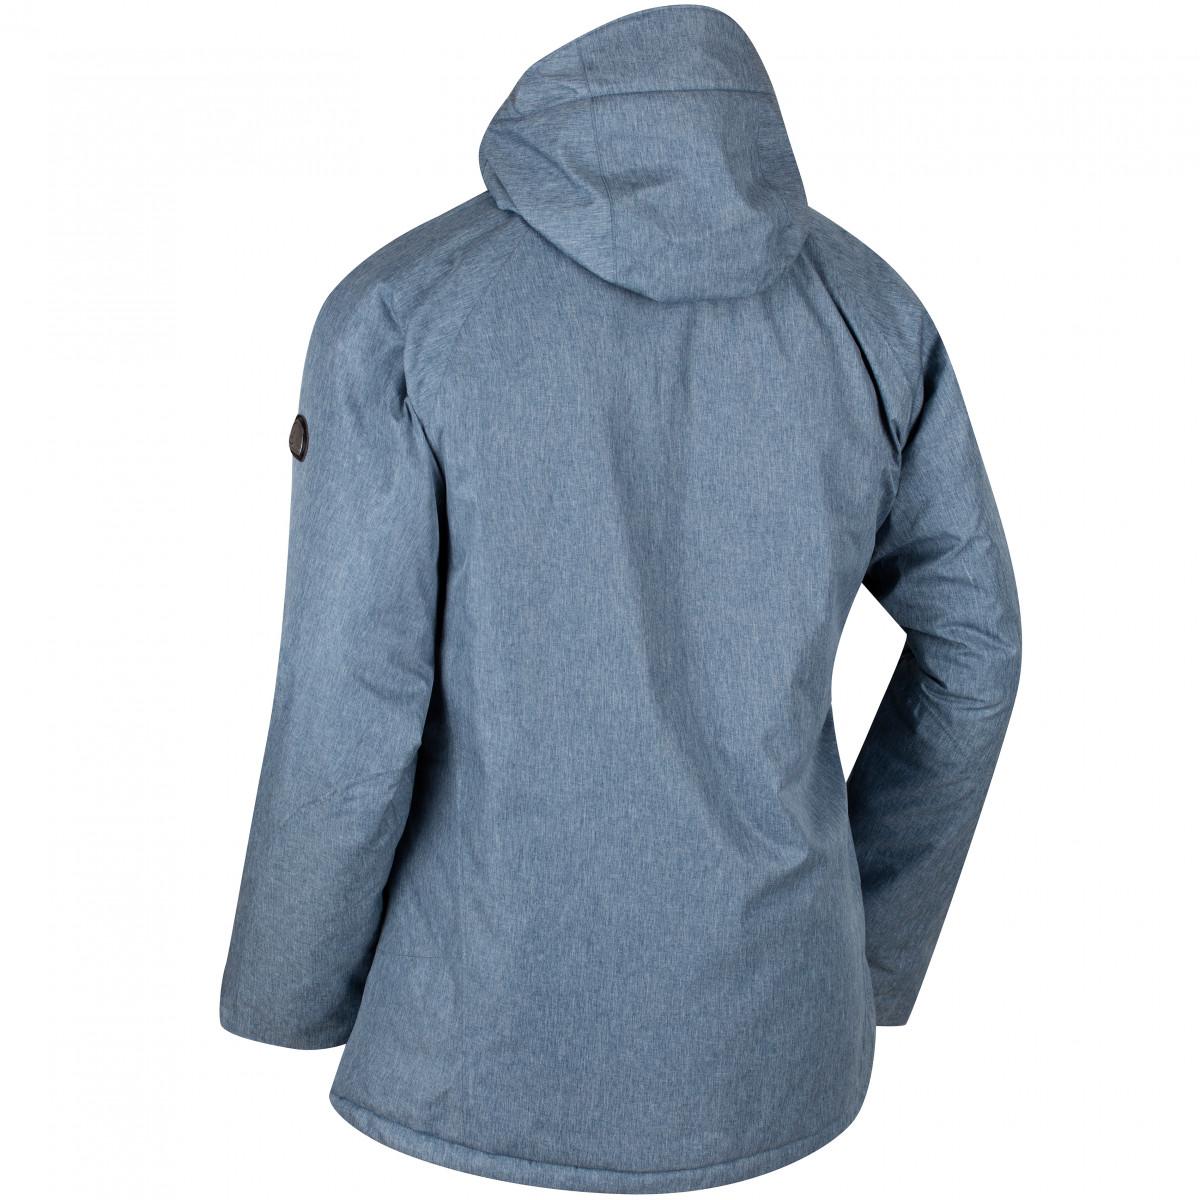 Regatta Mens Sternway II Waterproof Winter Insulated Coat Jacket 70/% OFF RRP